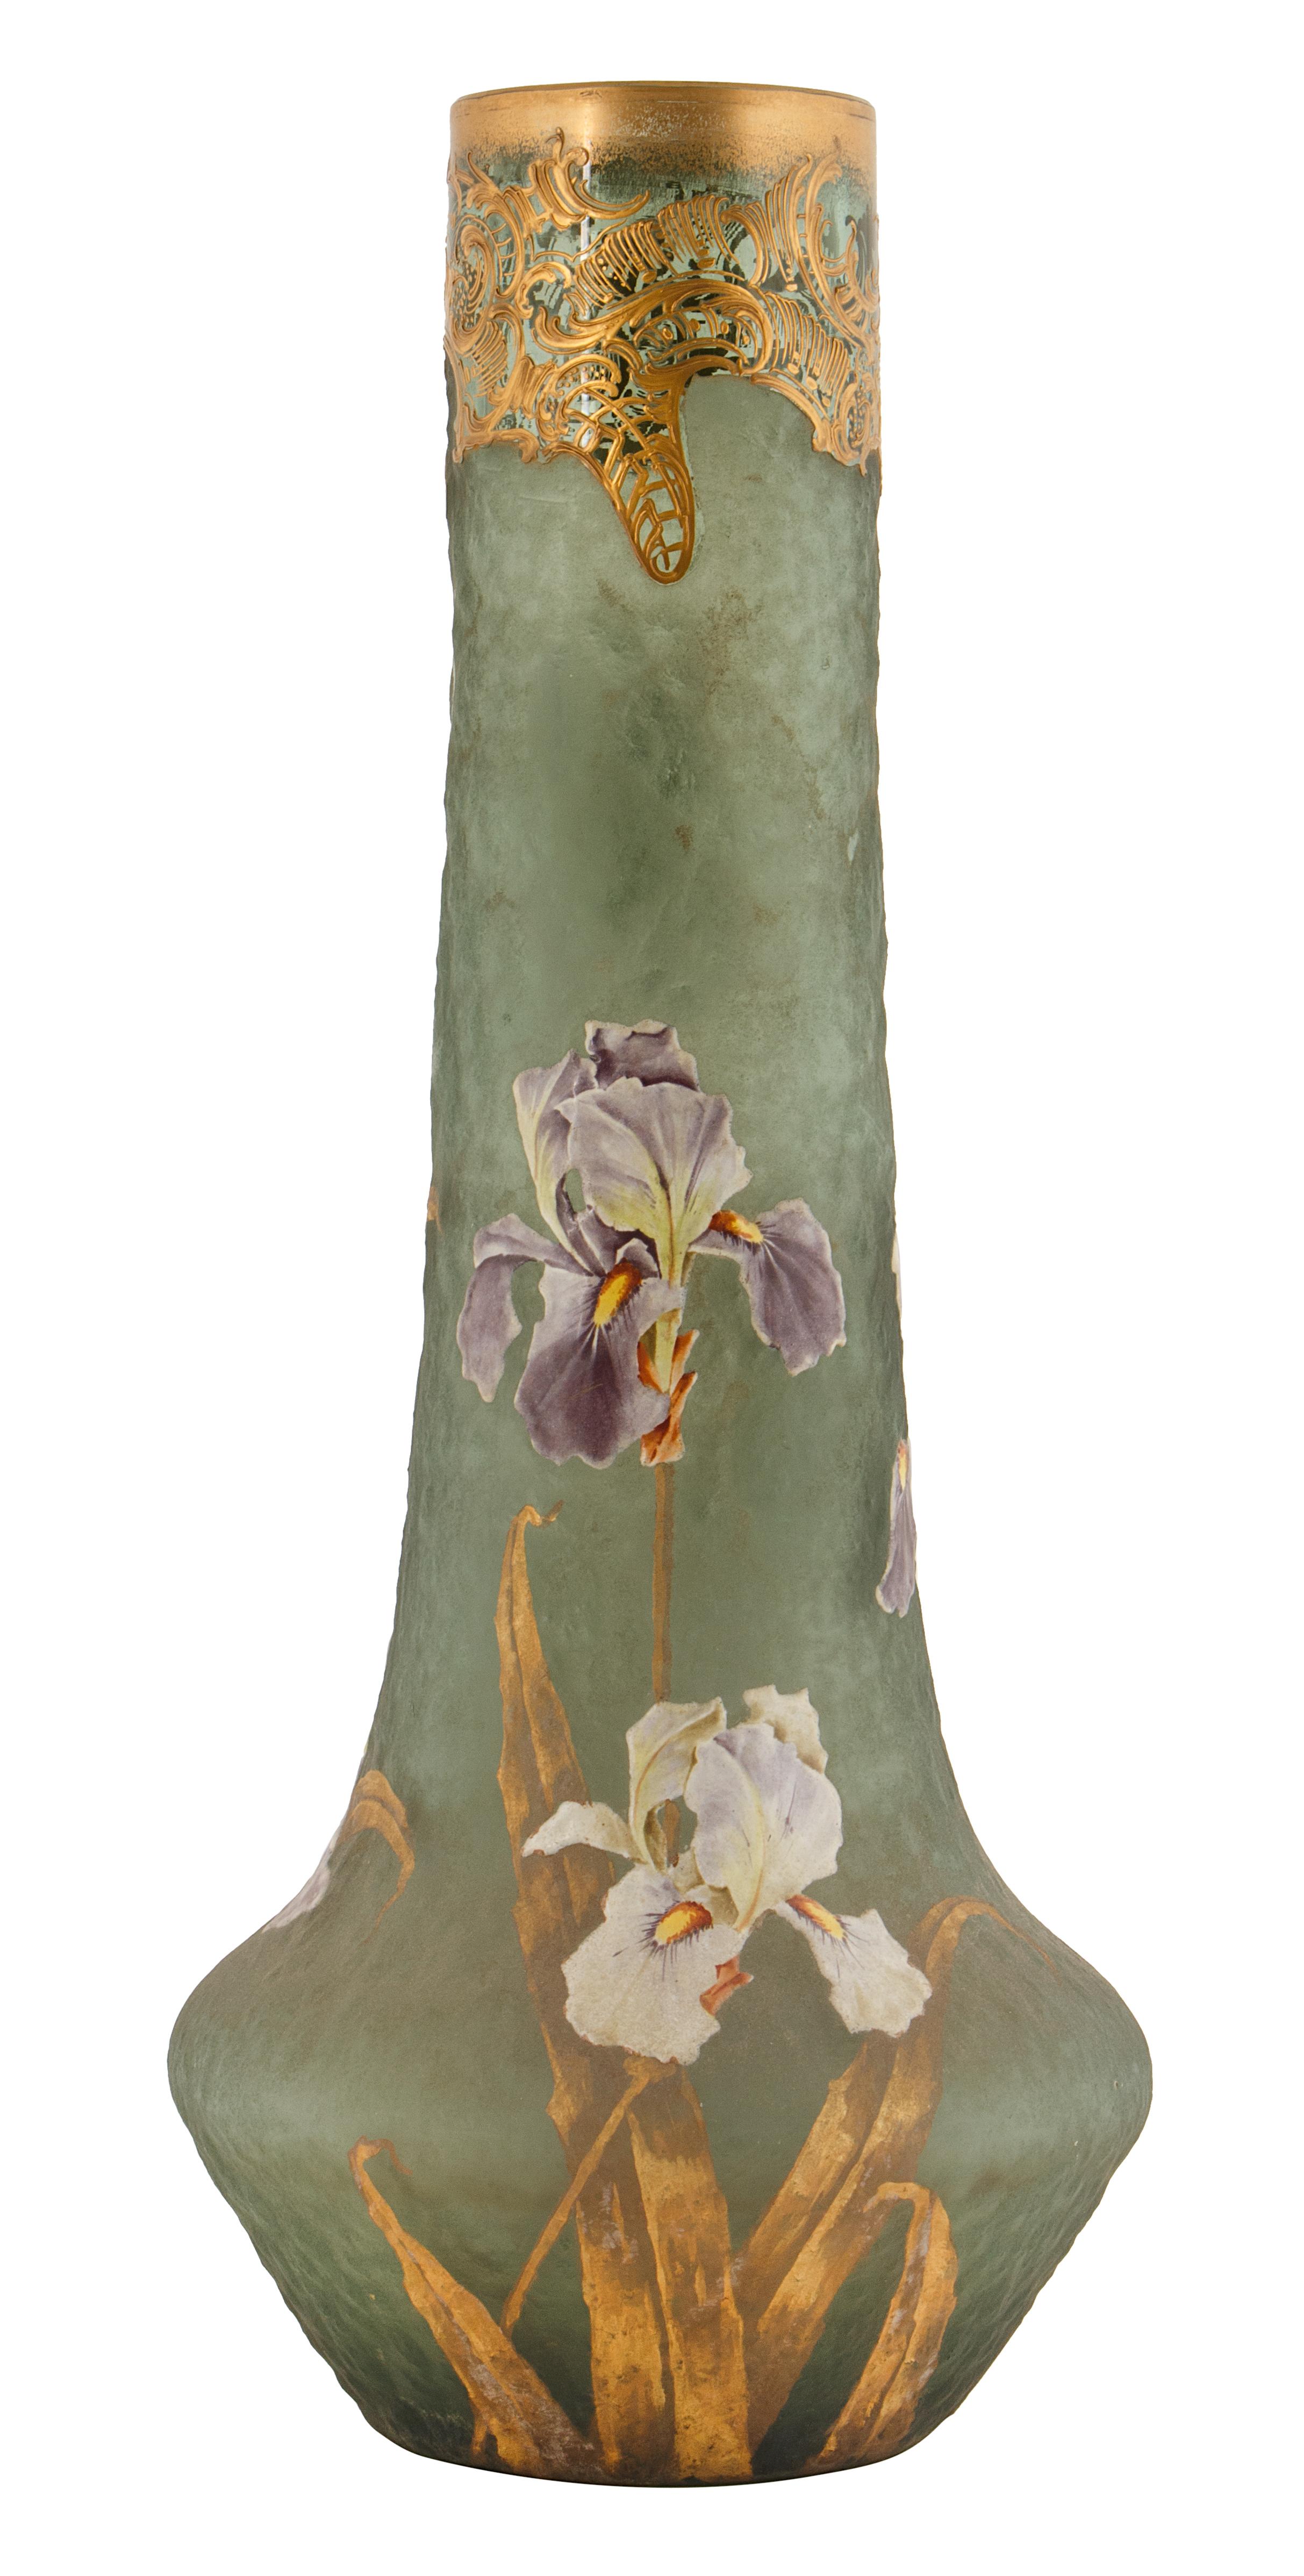 EARLY 20TH CENTURY ART NOUVEAU IRIS VASE - Image 2 of 3